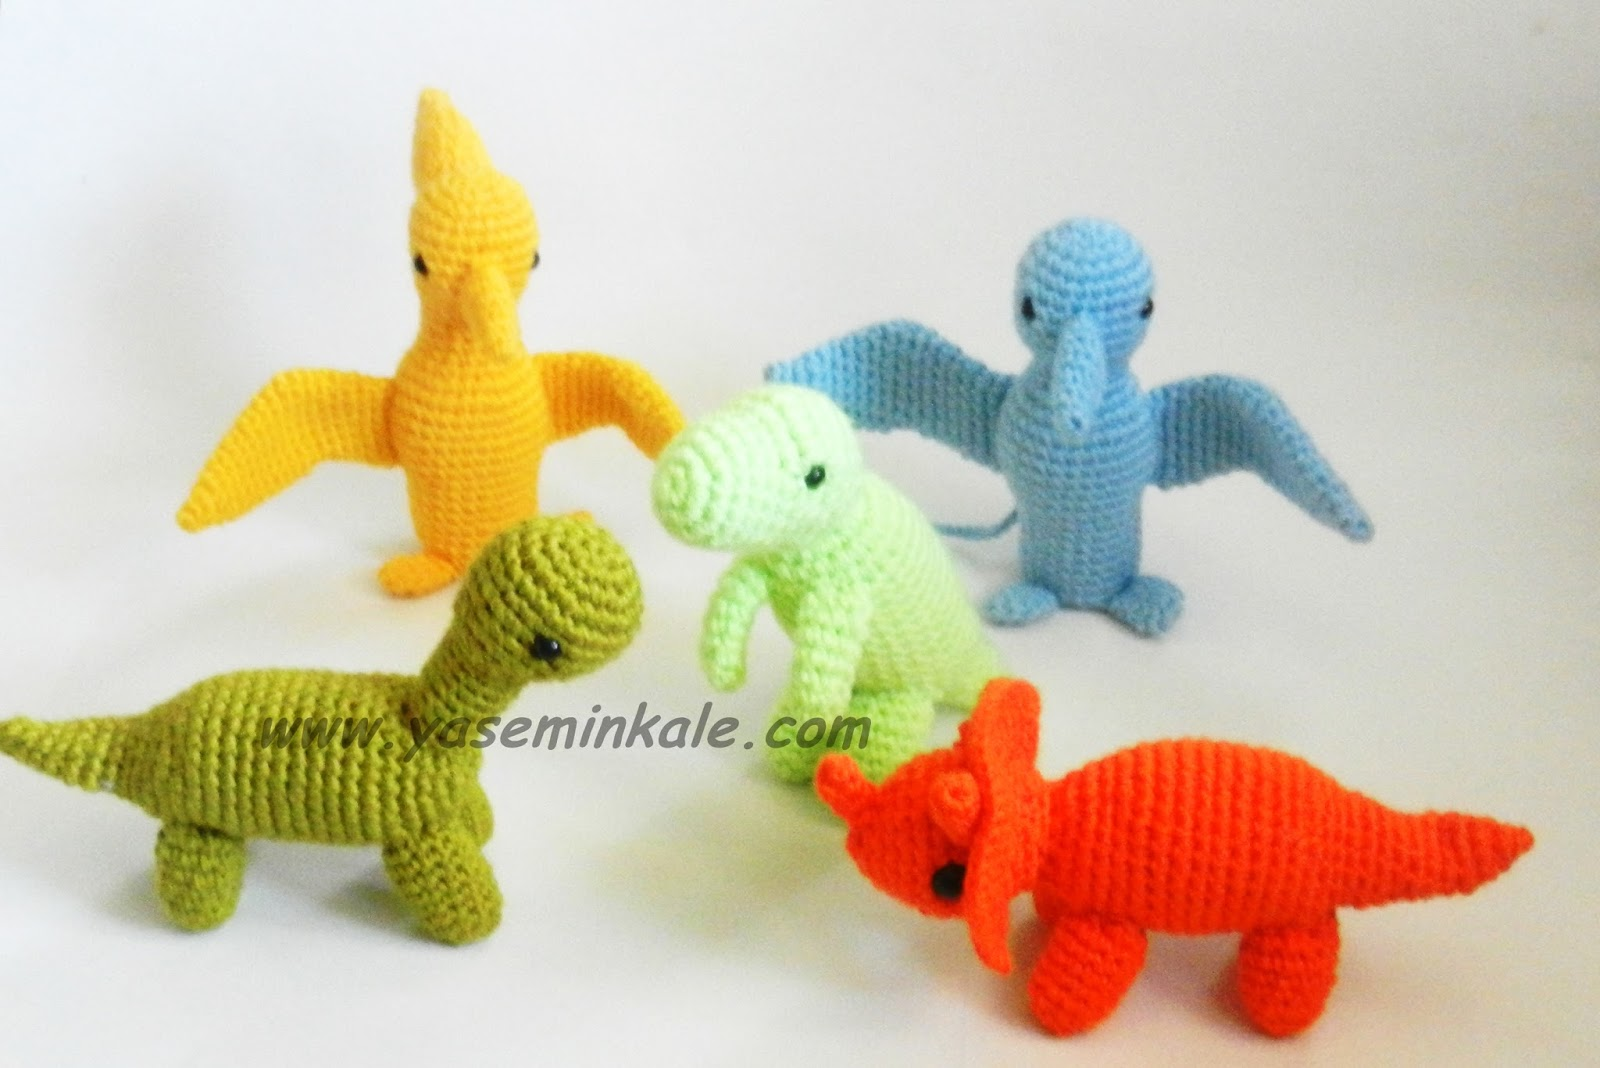 Yaseminkale: amigurumi dinazorlar:) amigurumi dinosaur